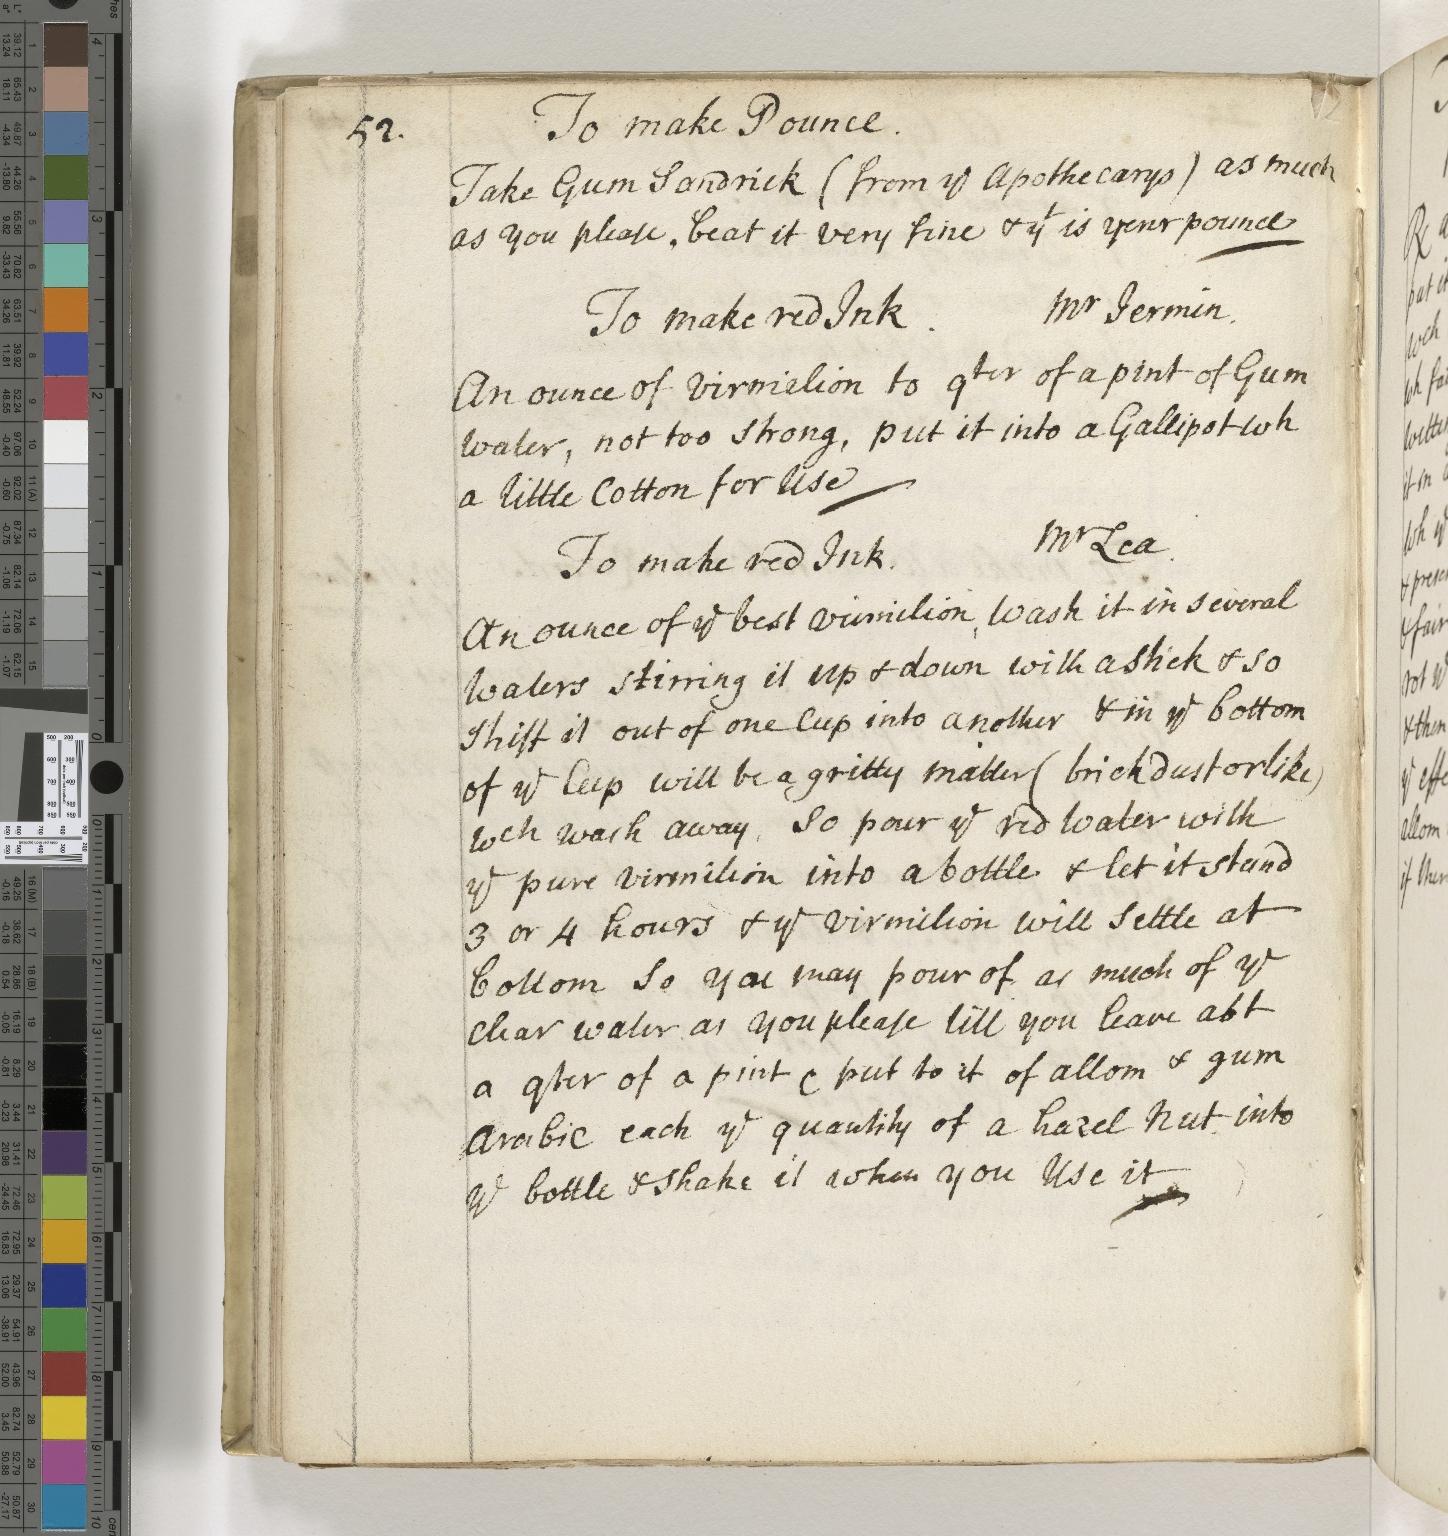 Miscellaneous receipts [manuscript].